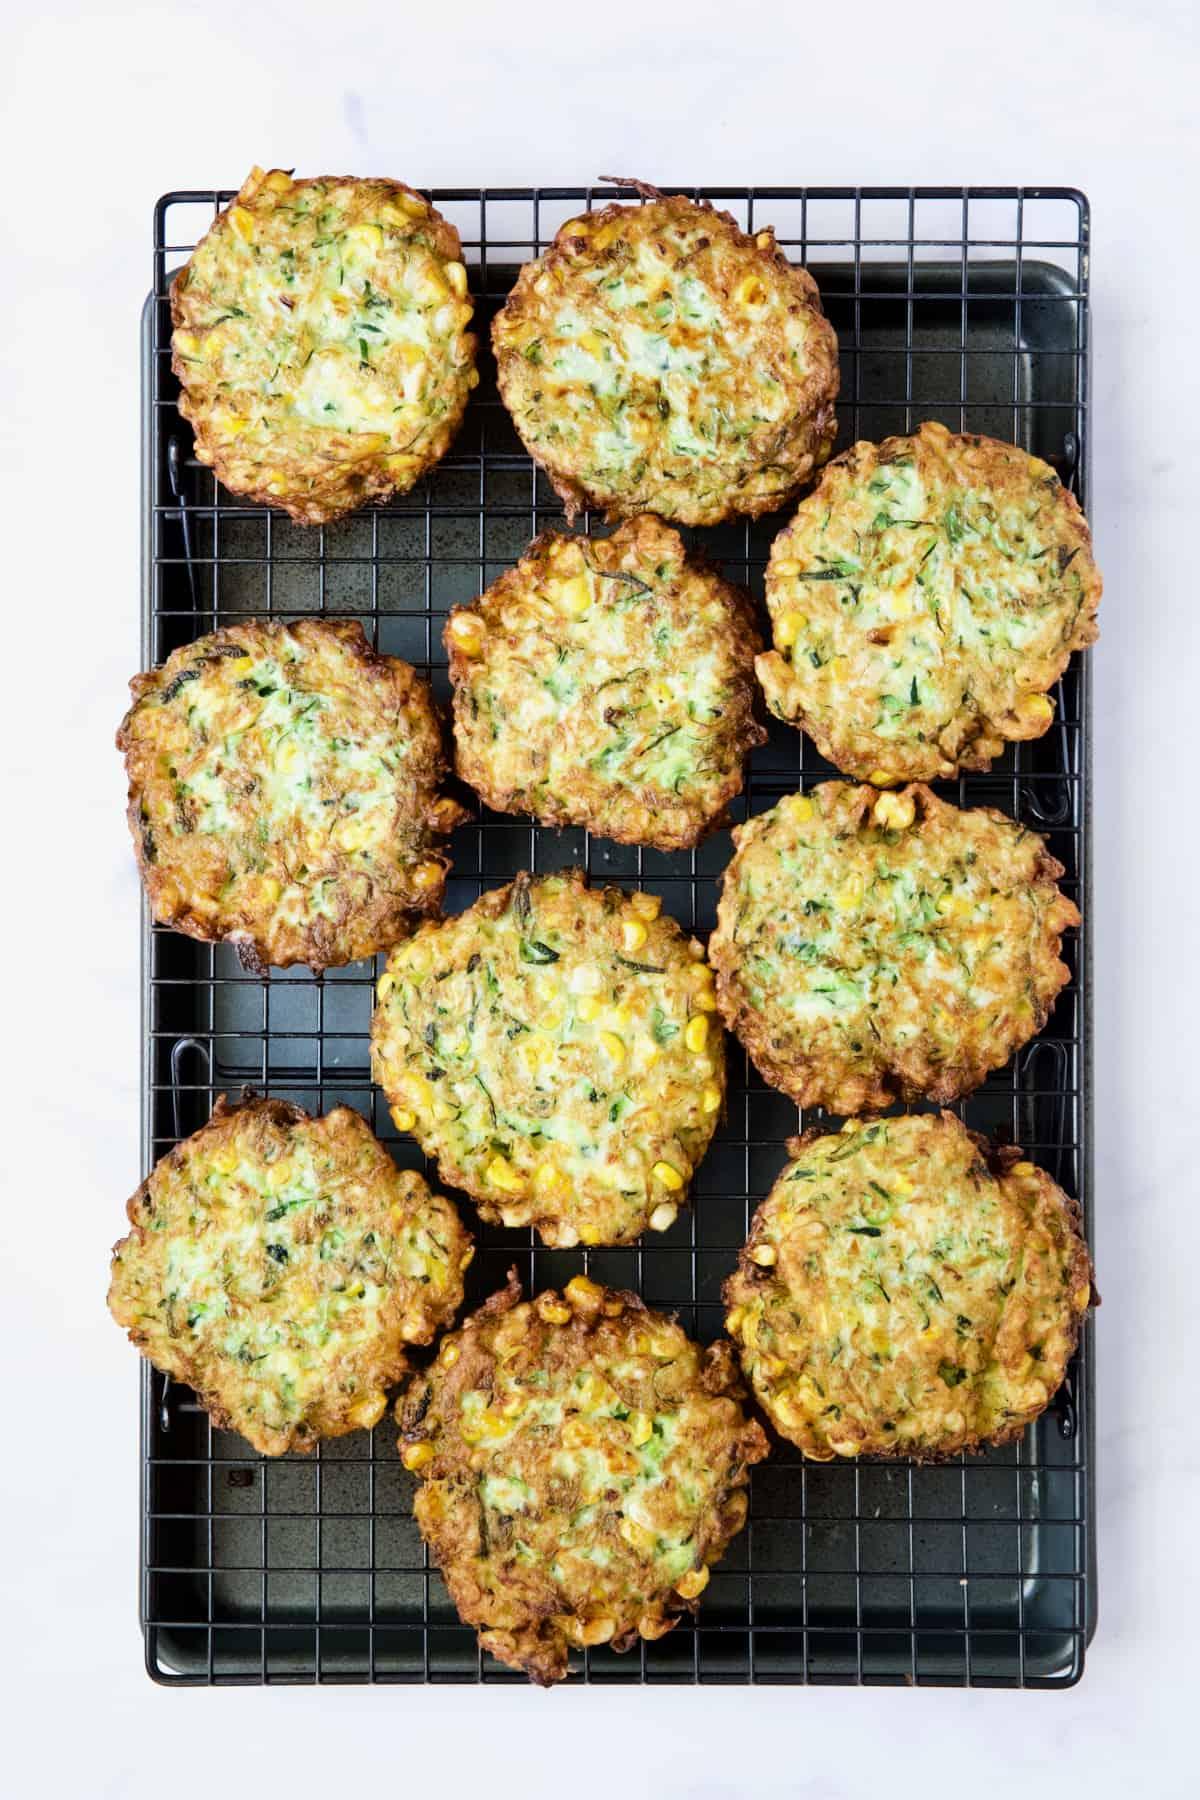 Ten Zucchini Corn Fritters on rack set over baking sheet.